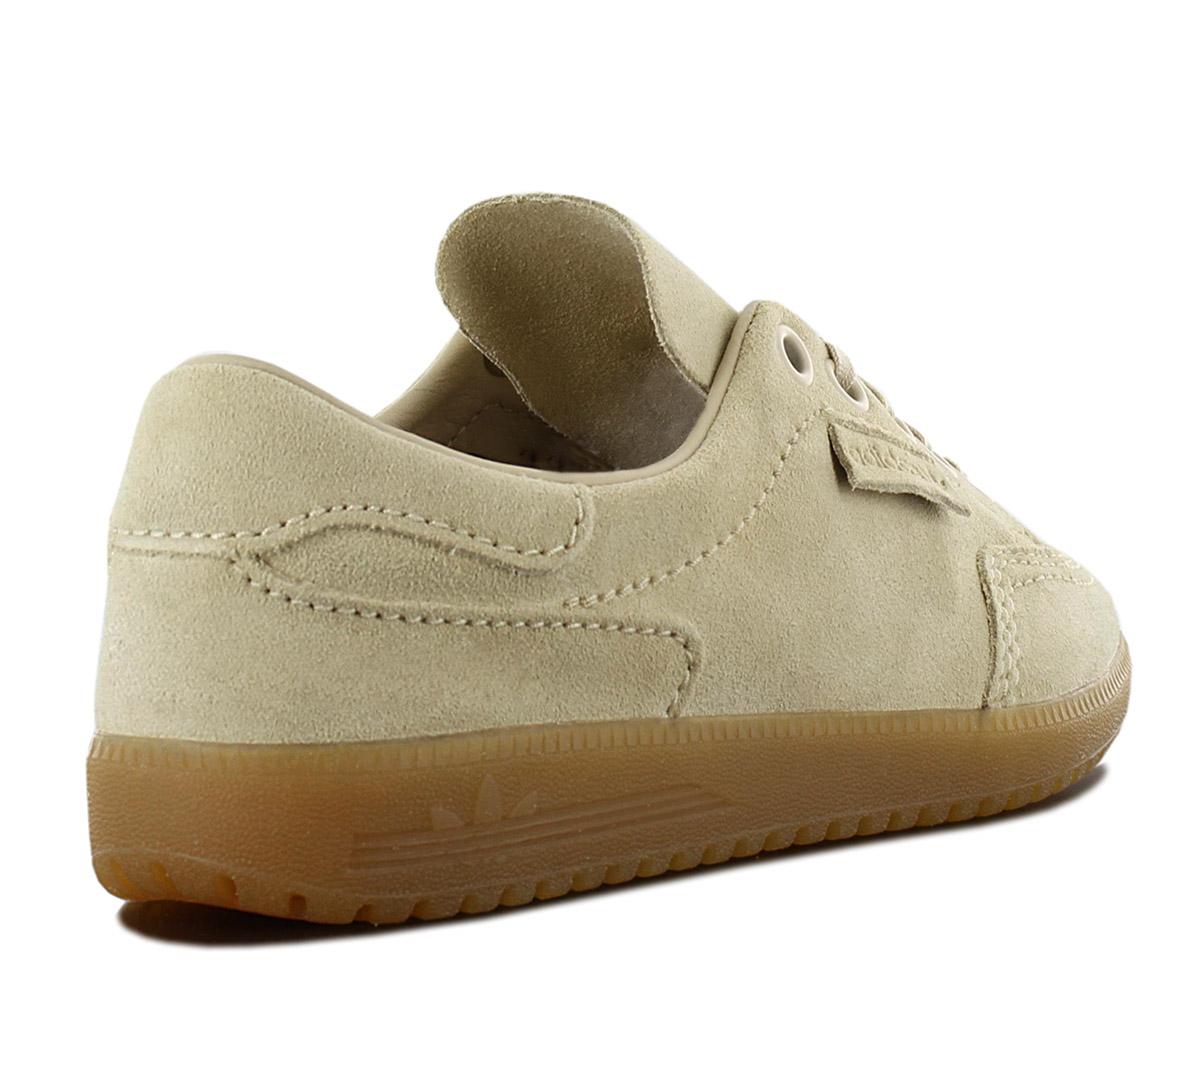 Details zu adidas Originals Spezial Garwen x Union LA Herren Sneaker BD7187 Schuhe NEU